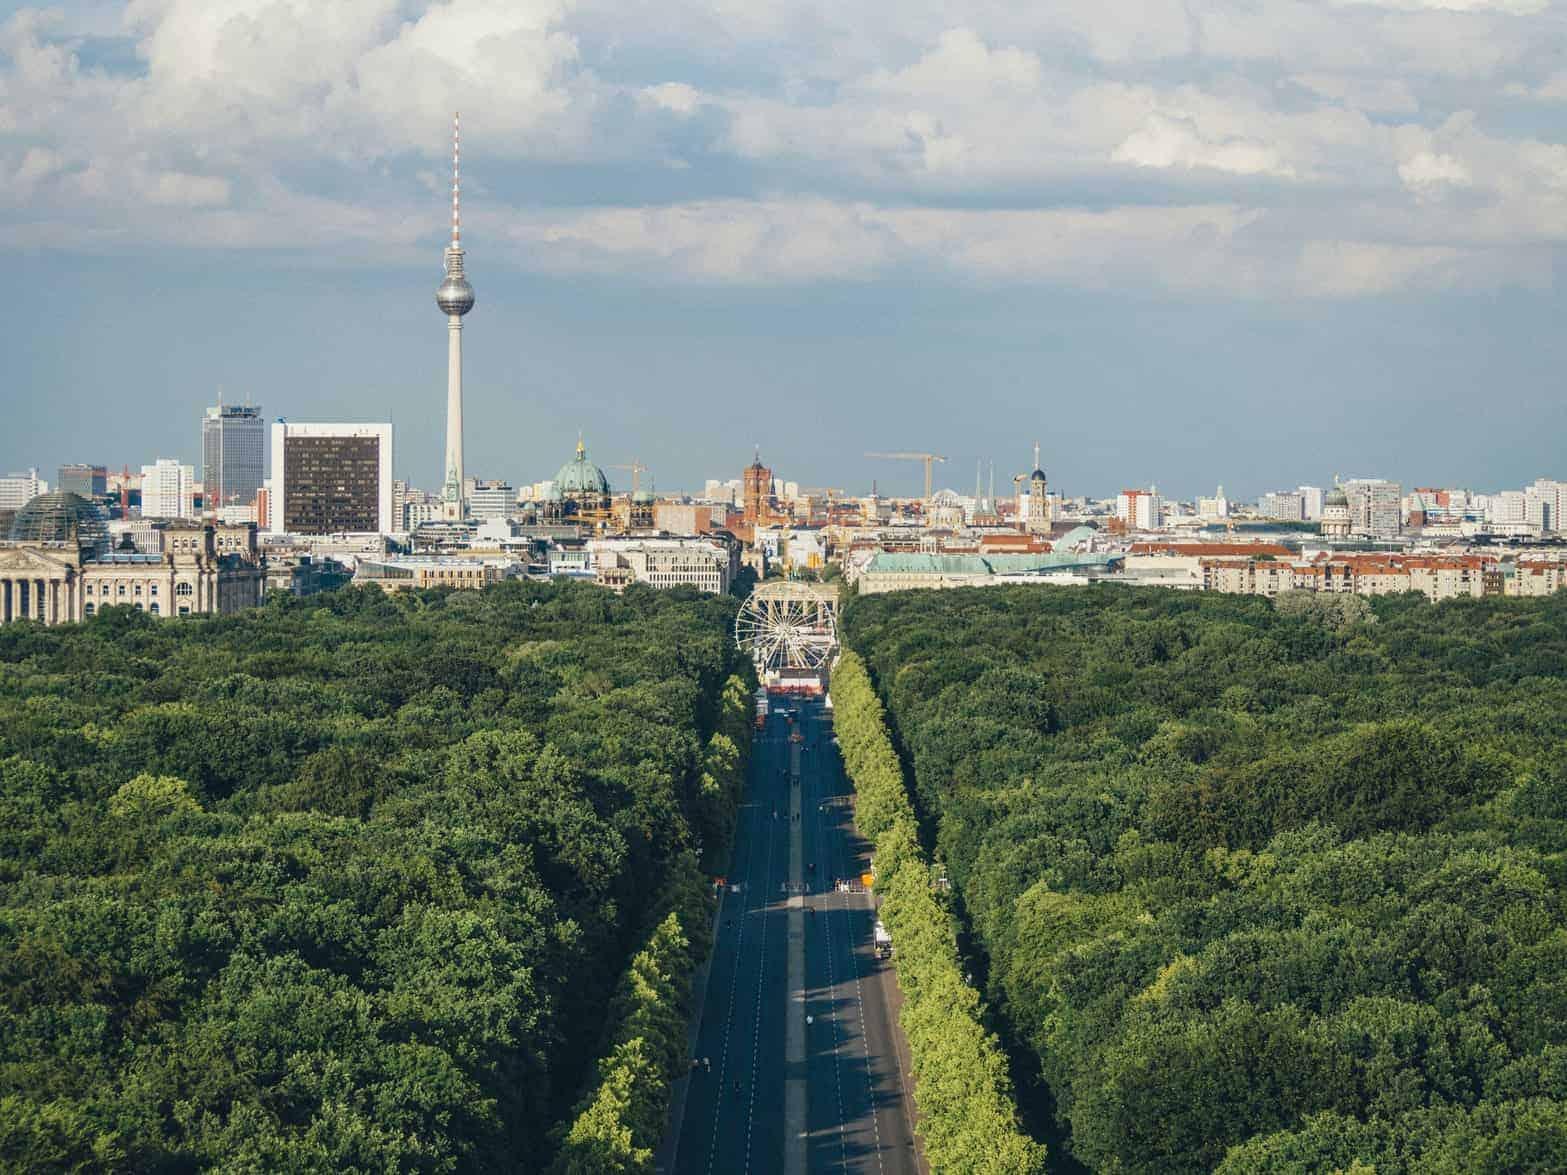 Immobilieninvestor in Berlin - Private Equity Investor kauft Büroimmobilien